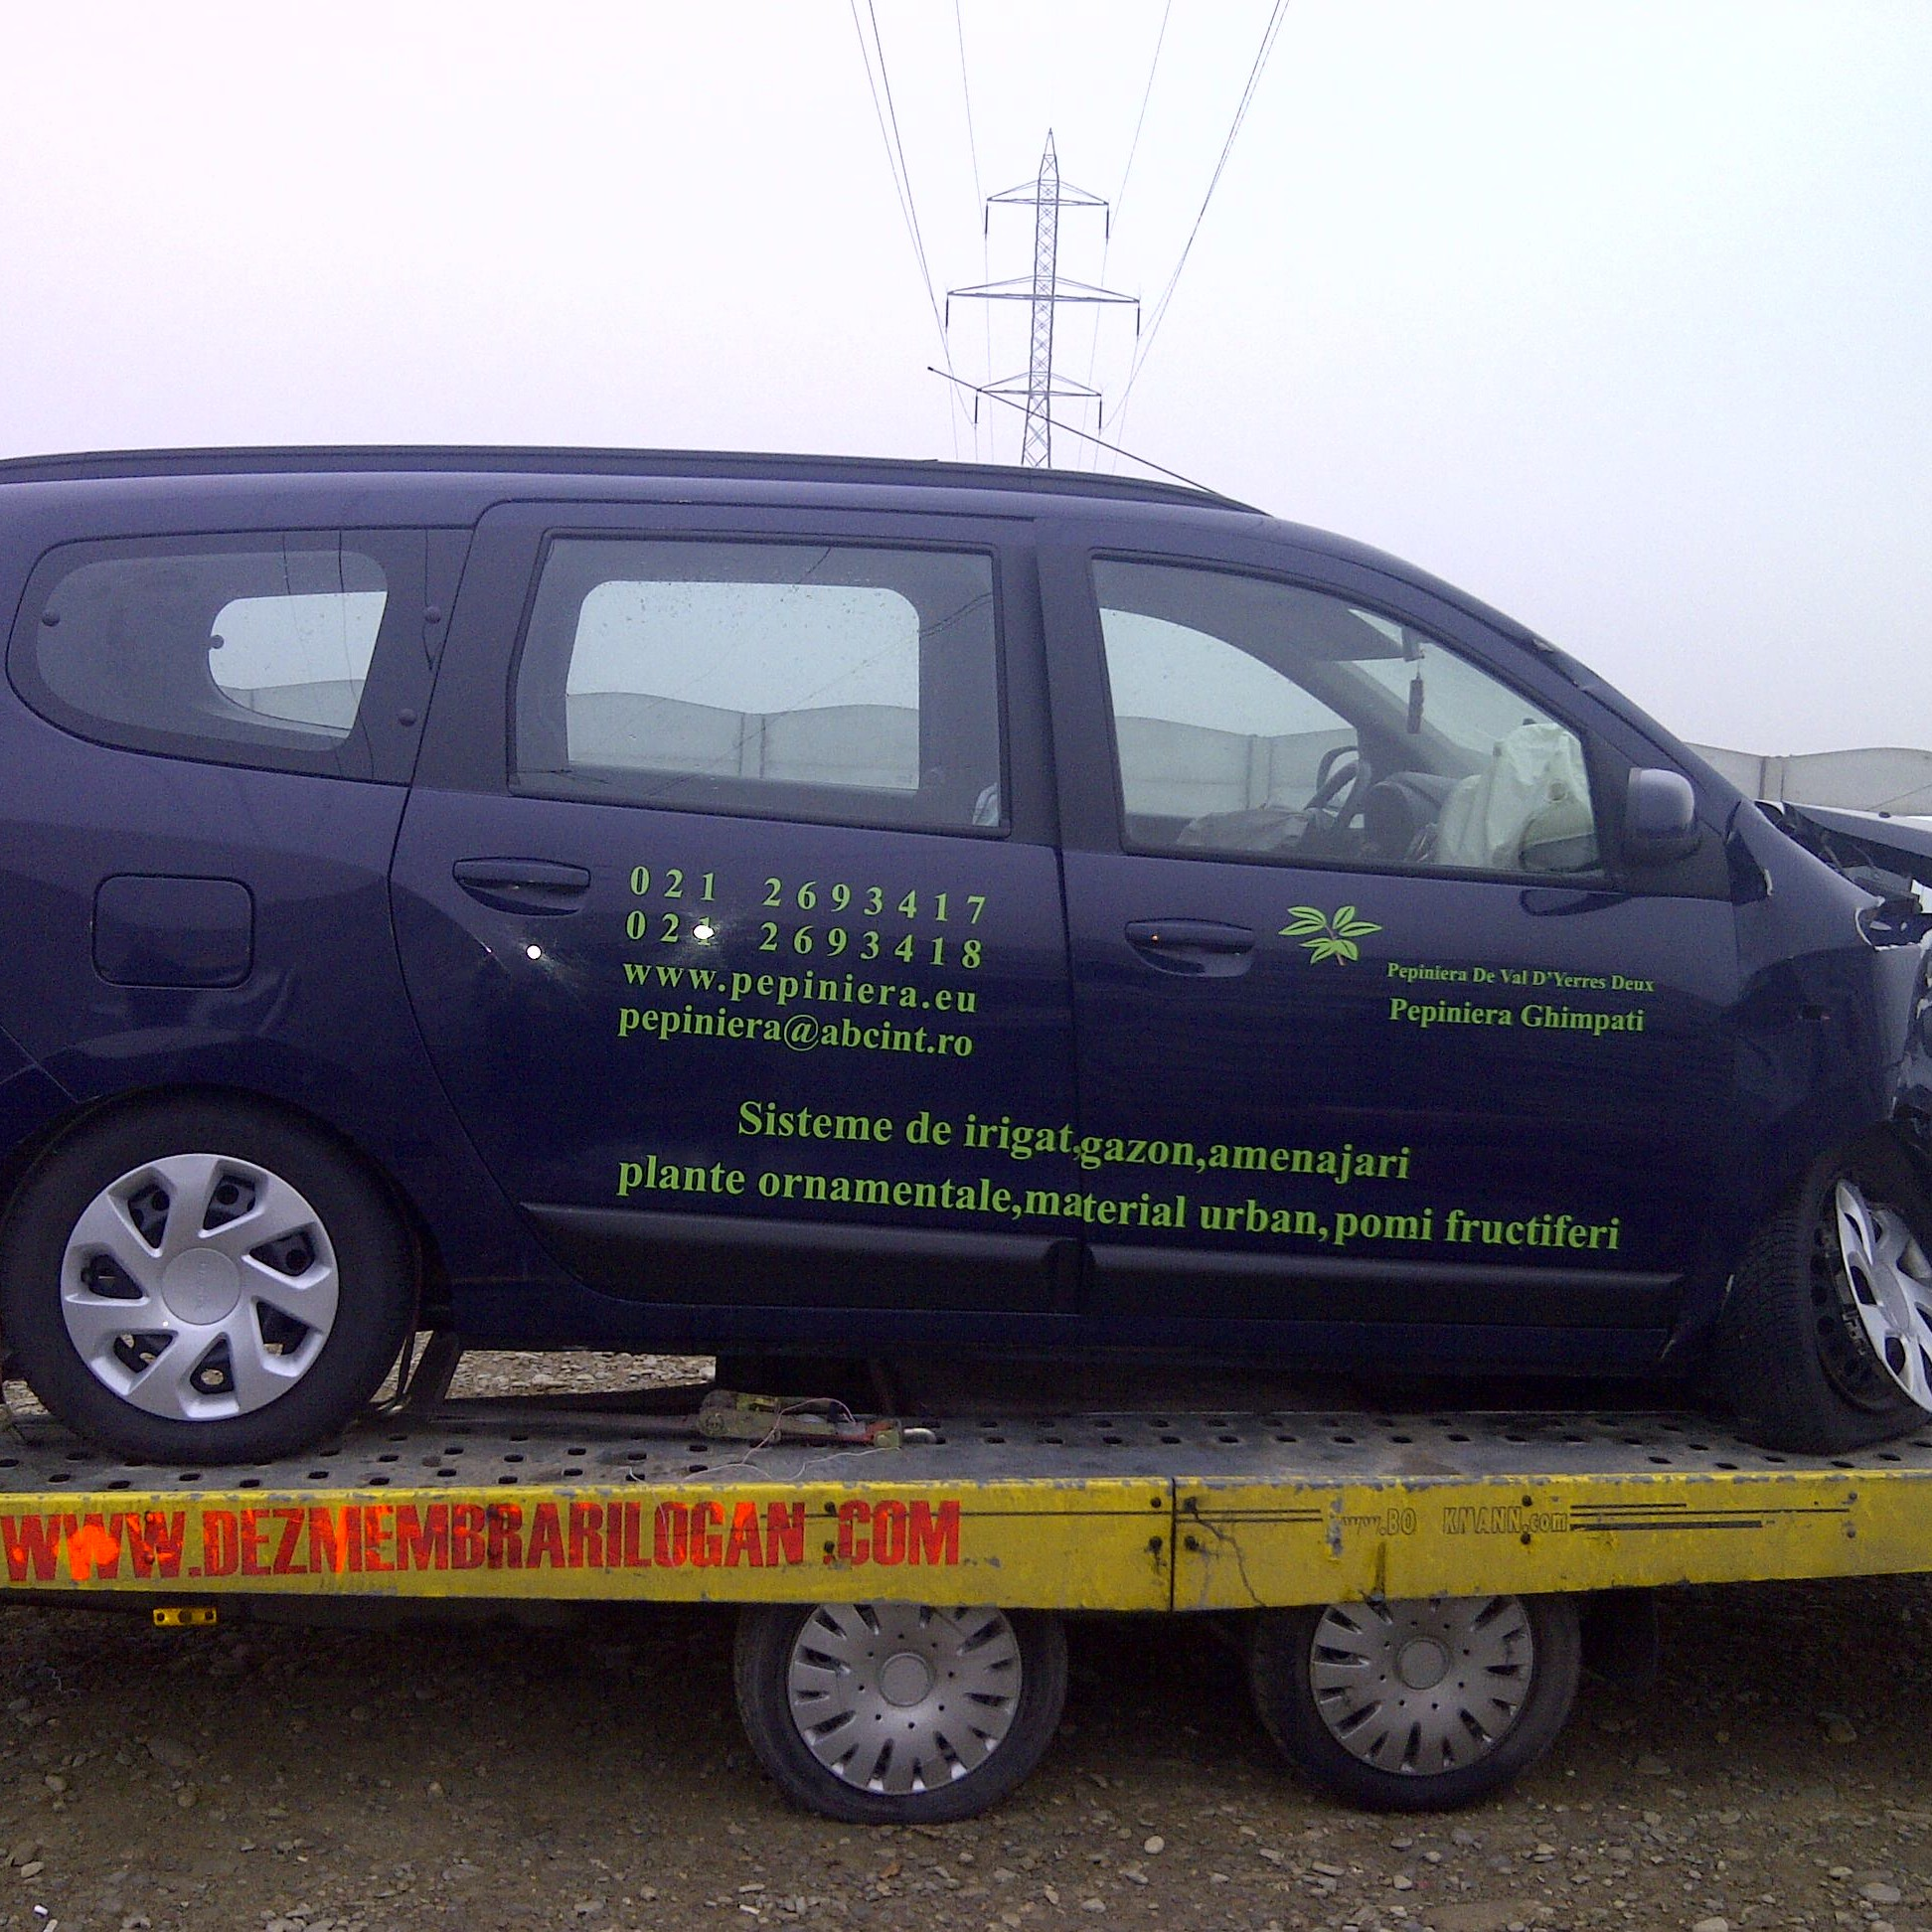 Dezmembrari Dacia Lodgy